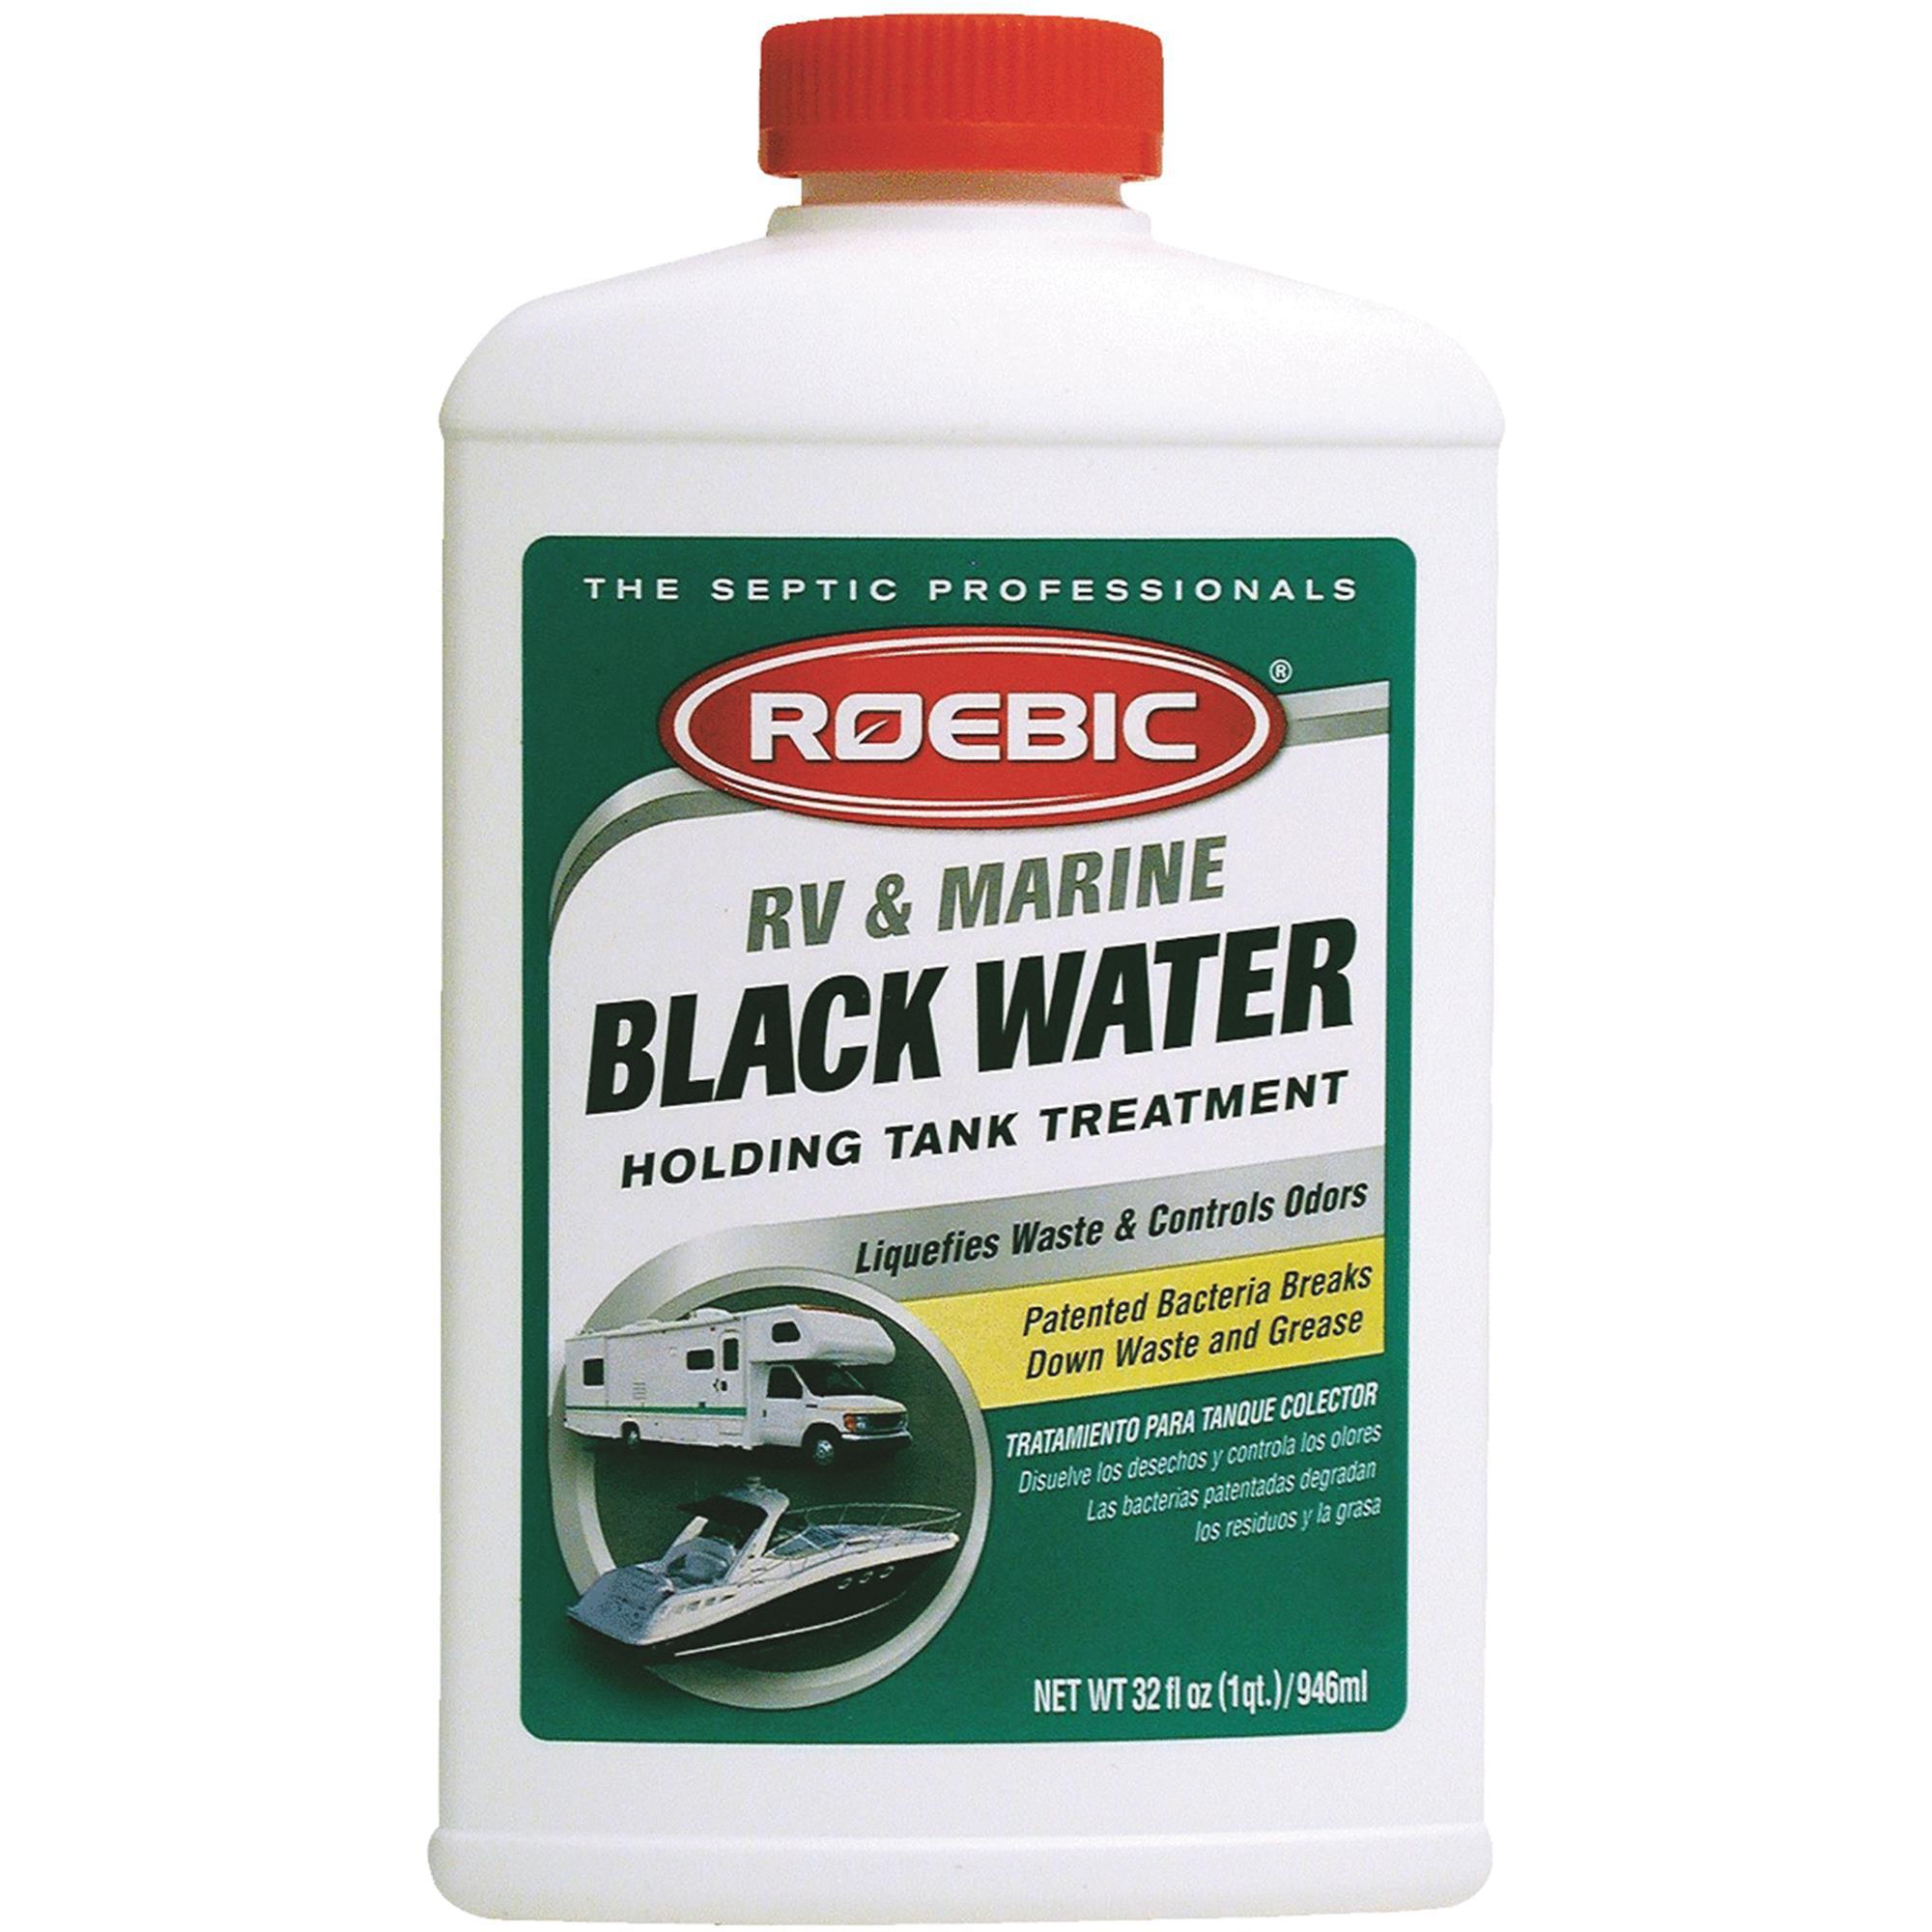 RV & Marine Holding Tank Treatment by Roebic Laboratories